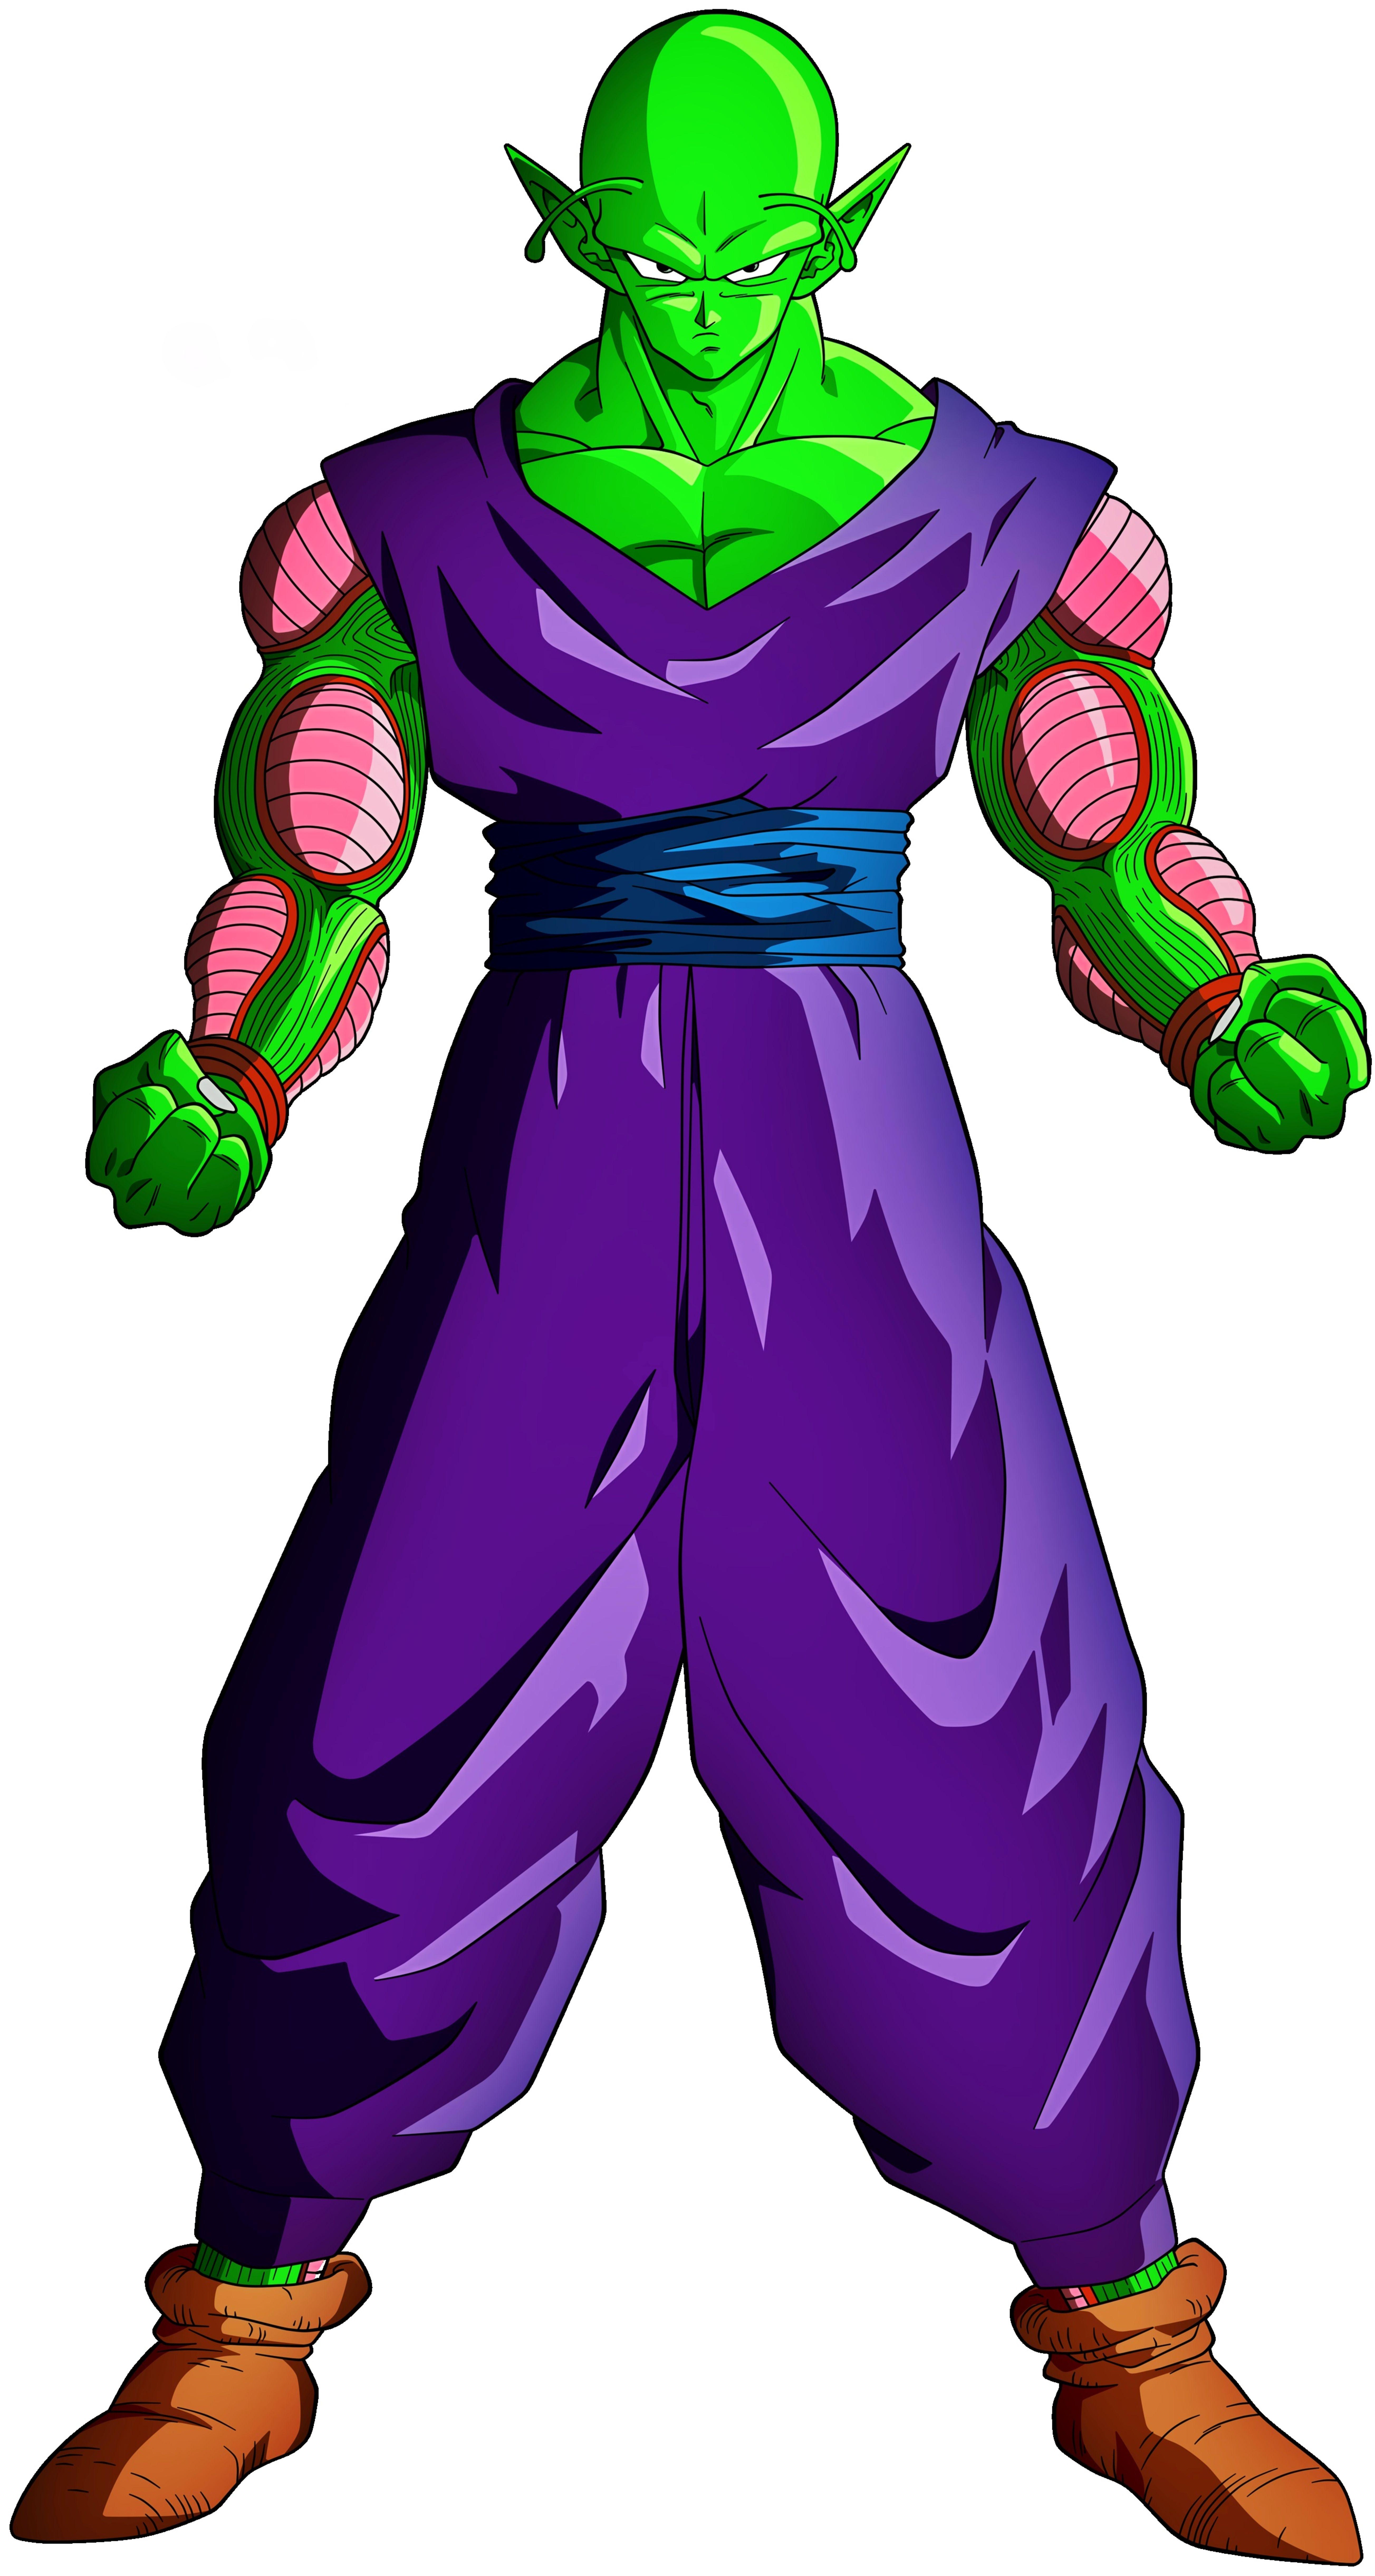 Piccolo Personajes De Dragon Ball Personajes De Goku Dragones